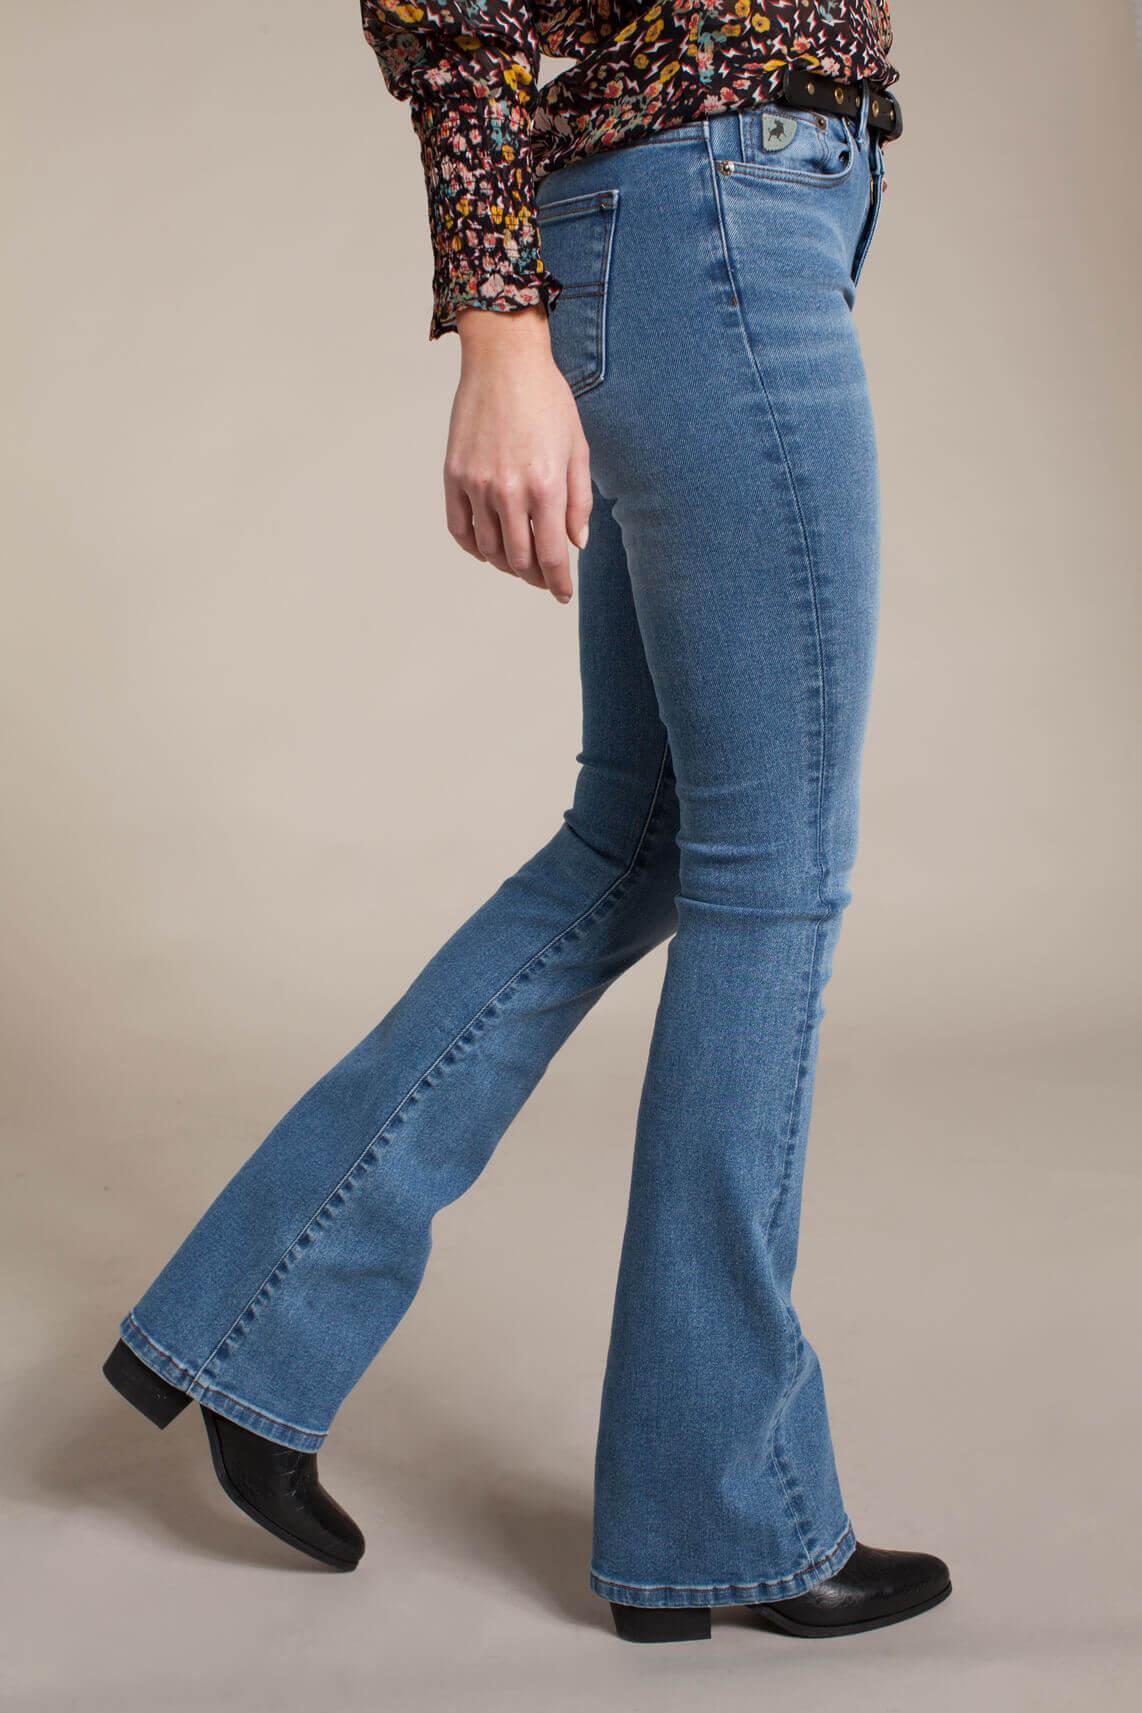 Lois Dames L34 Raval super high rise flared jeans Blauw